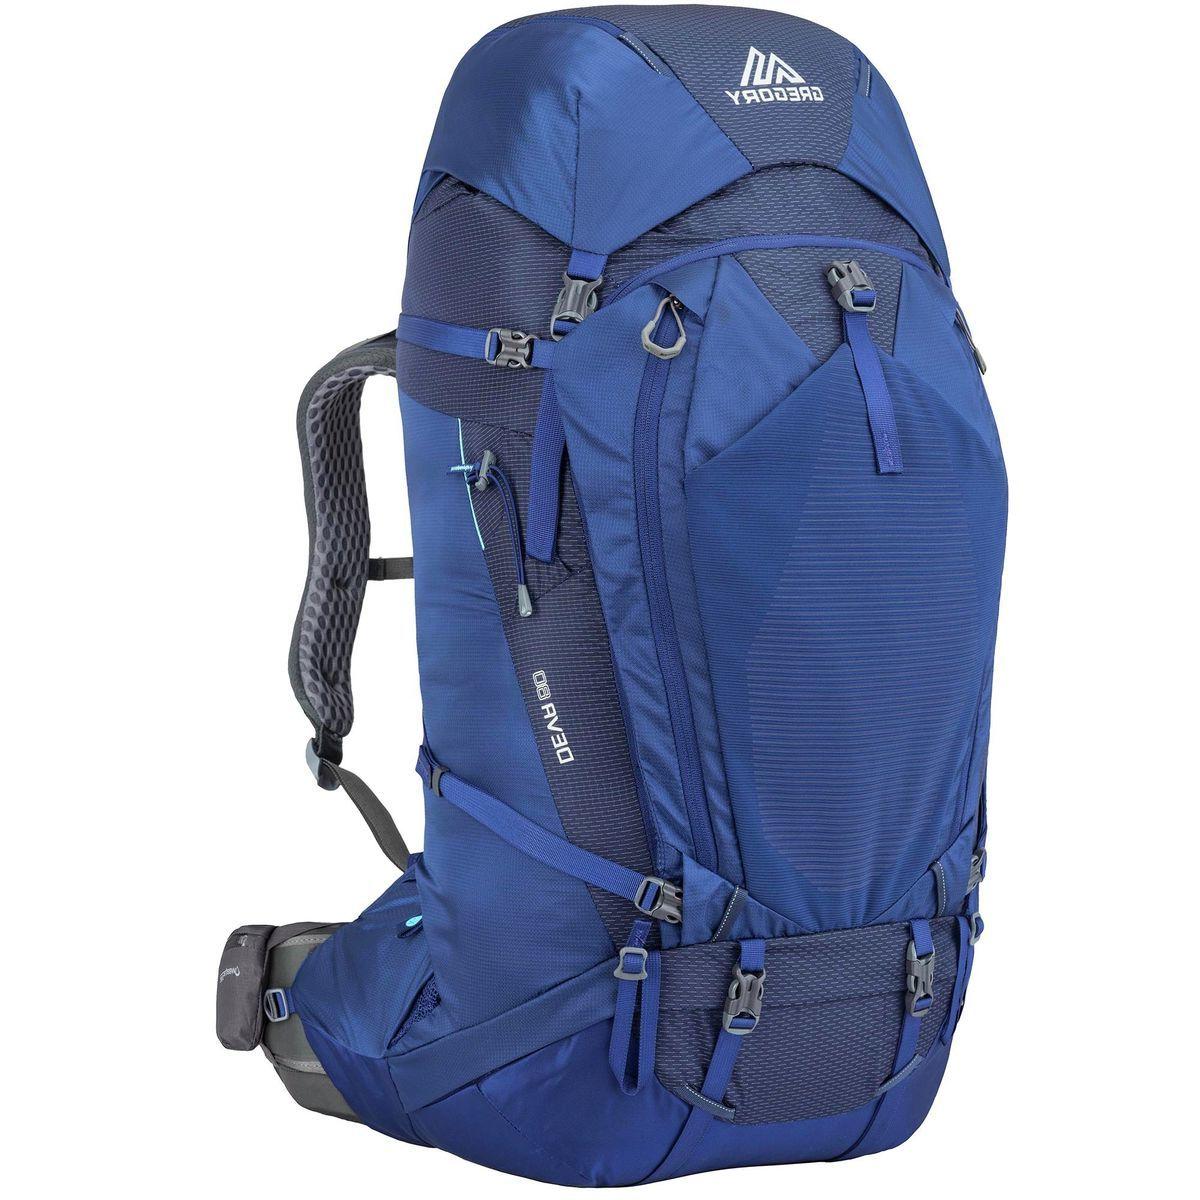 Gregory Deva 80L Backpack - Women's